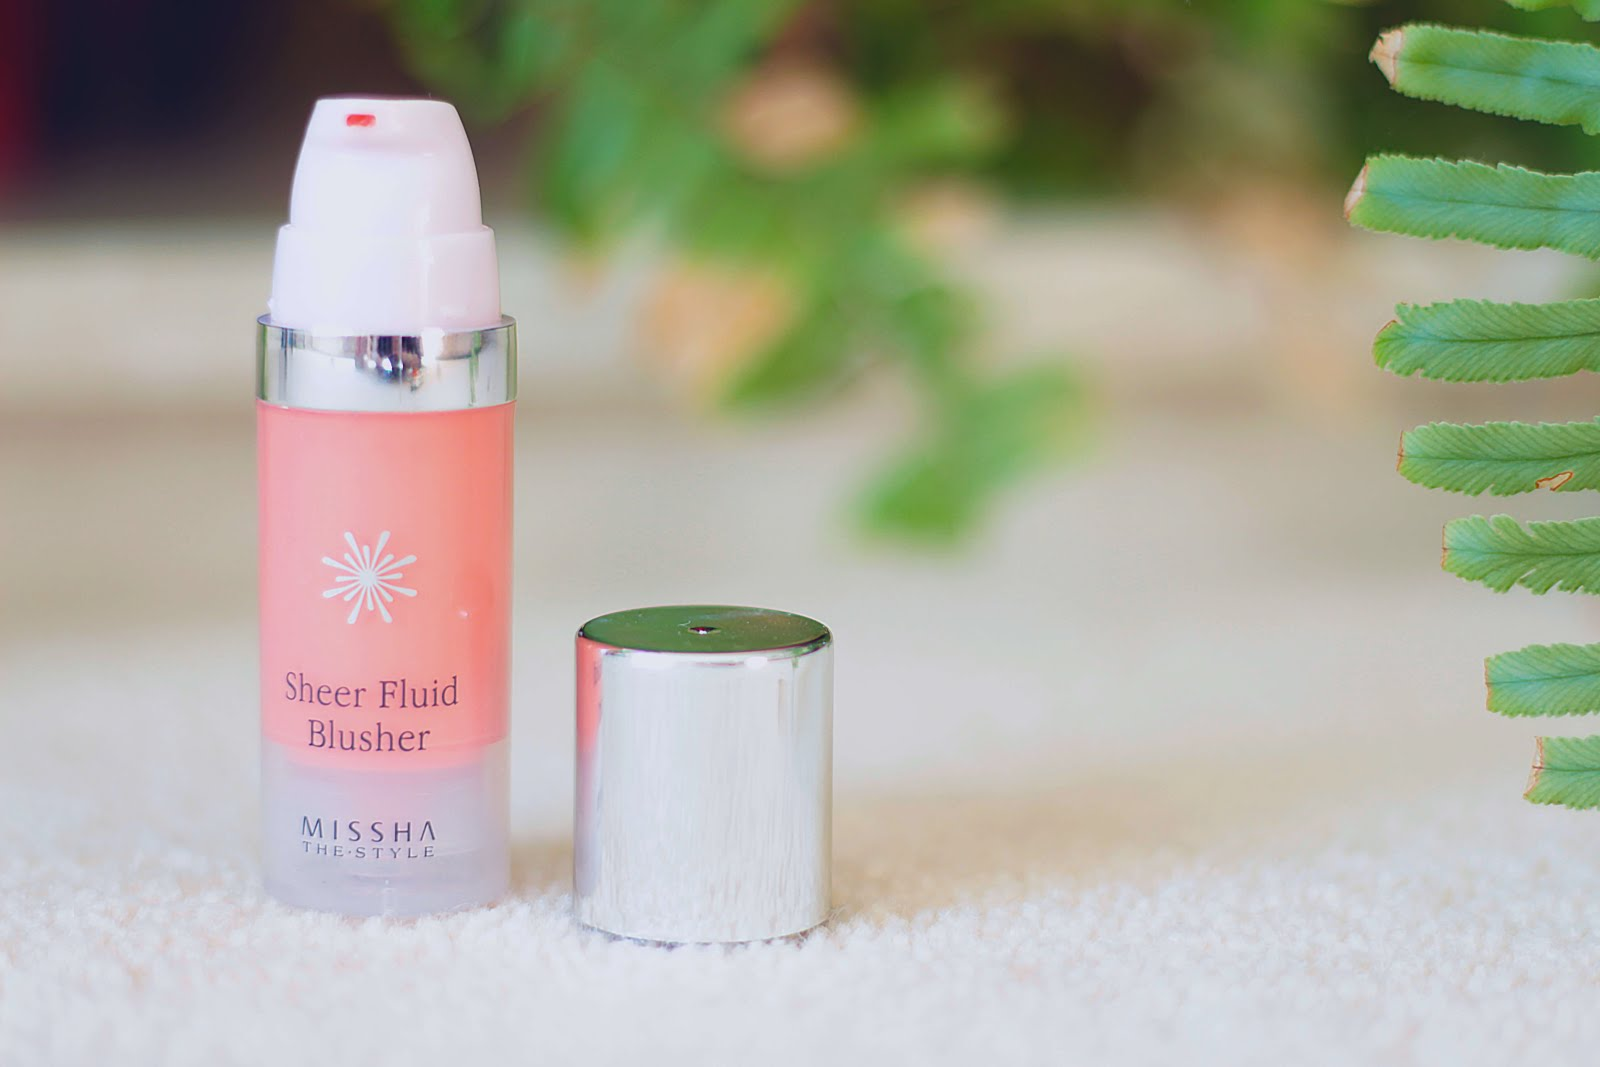 review missha sheer fluid blusher vivid coral uk beauty blogger